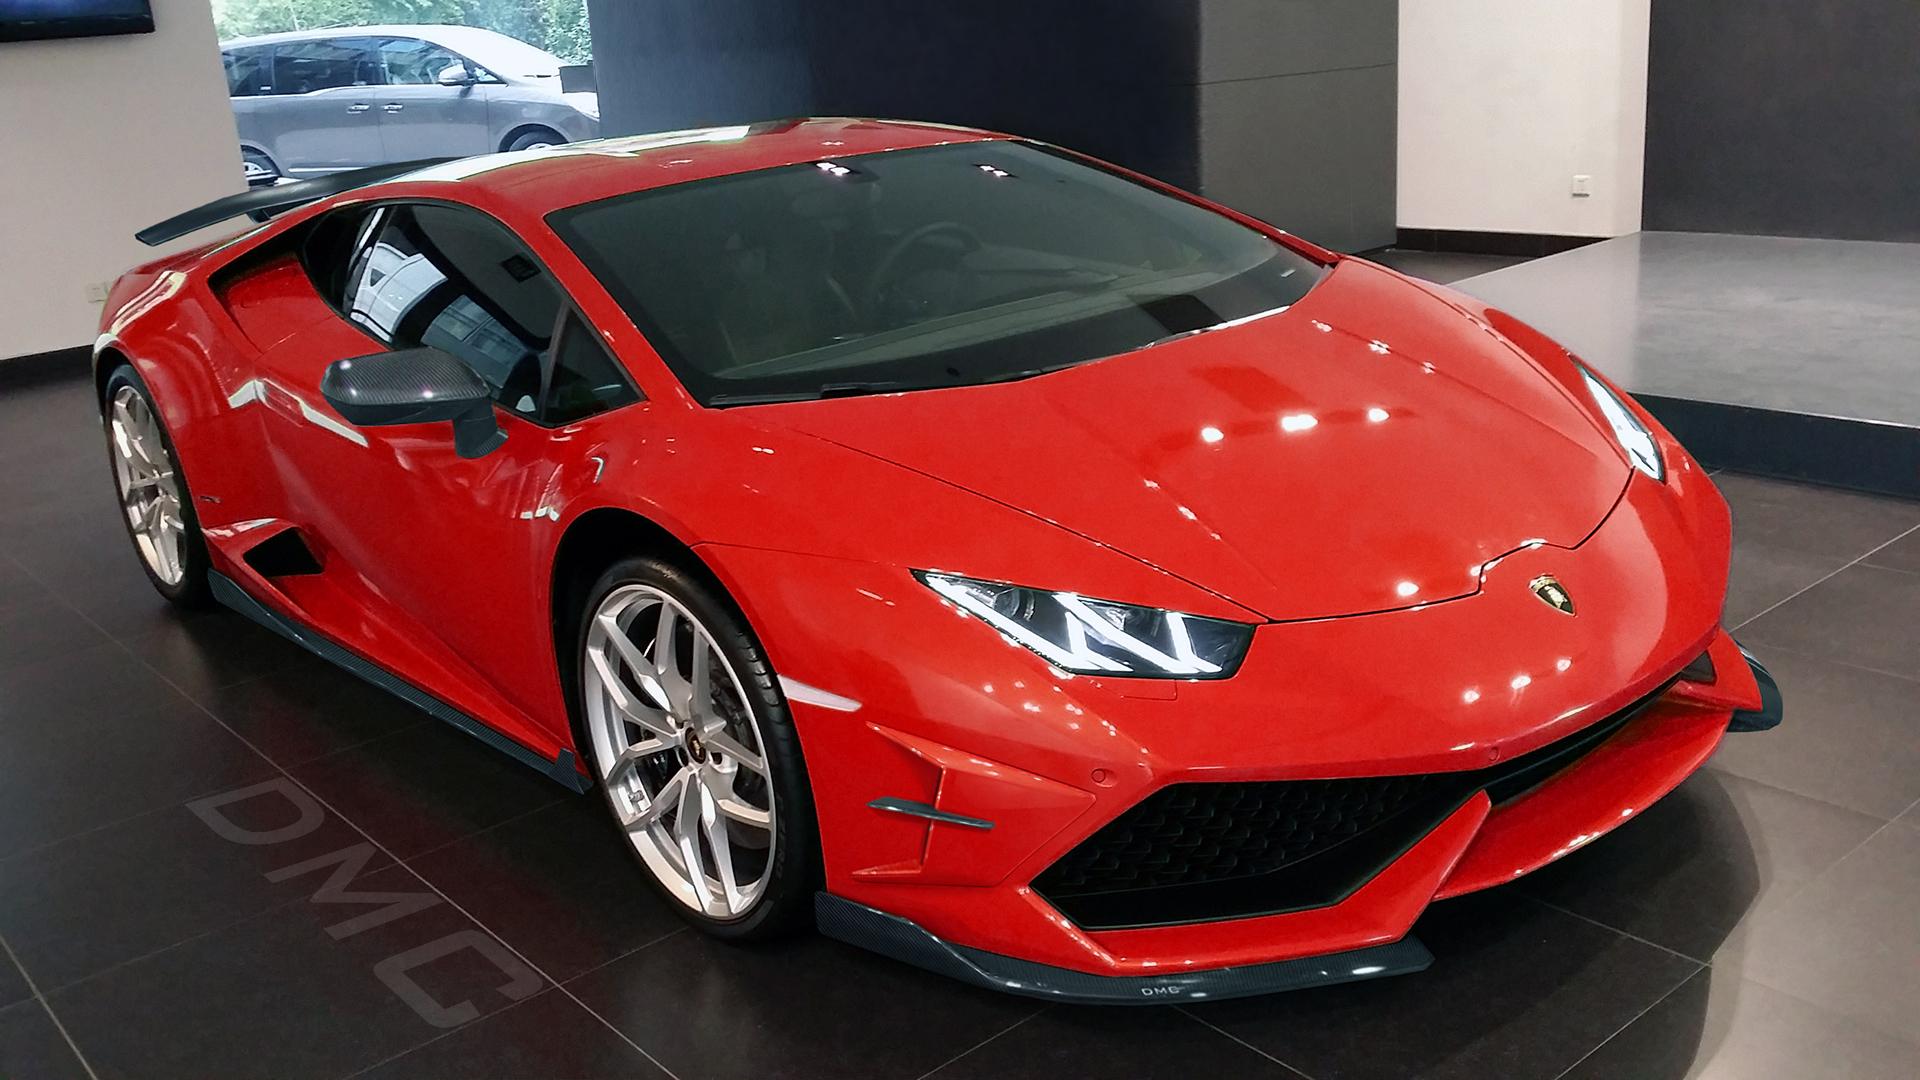 2 Mesmerizing Lamborghini Huracan Price In south Africa Cars Trend